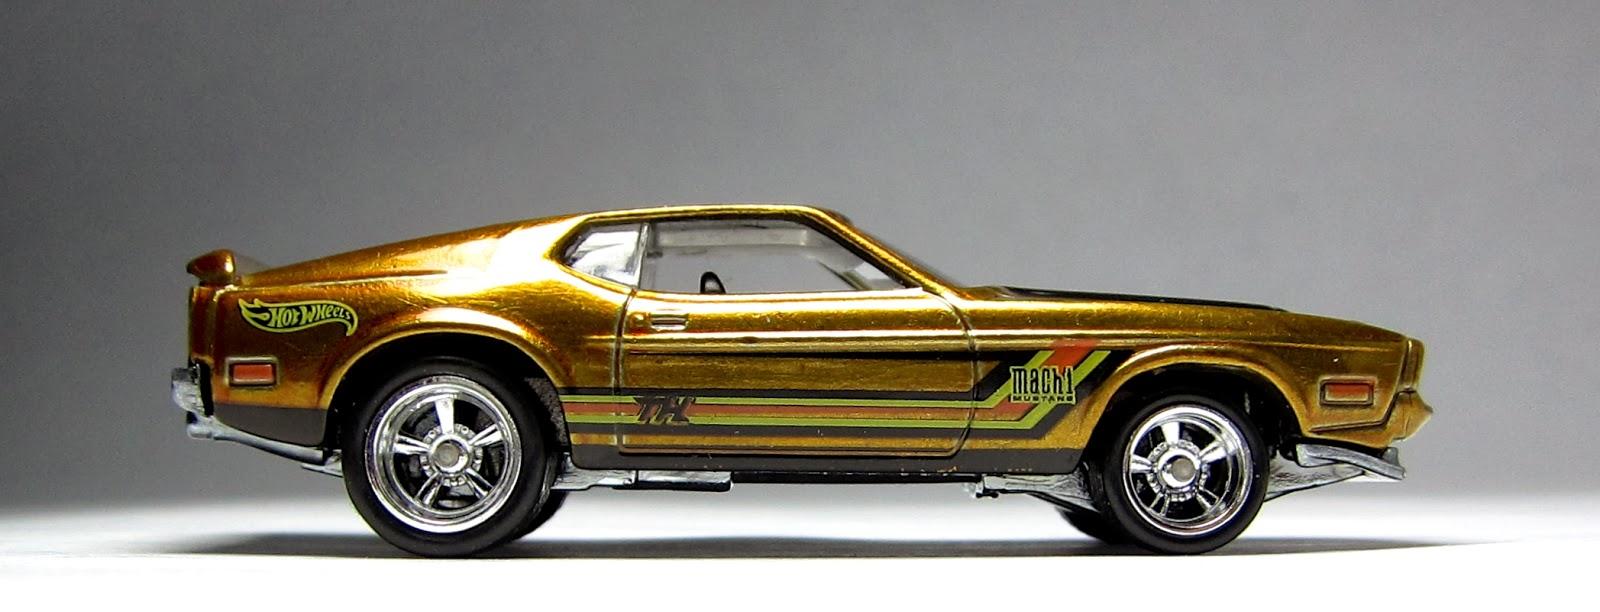 Details about 2014 Hot Wheels Super Hidden Treasure T Hunt Sandblaster ...